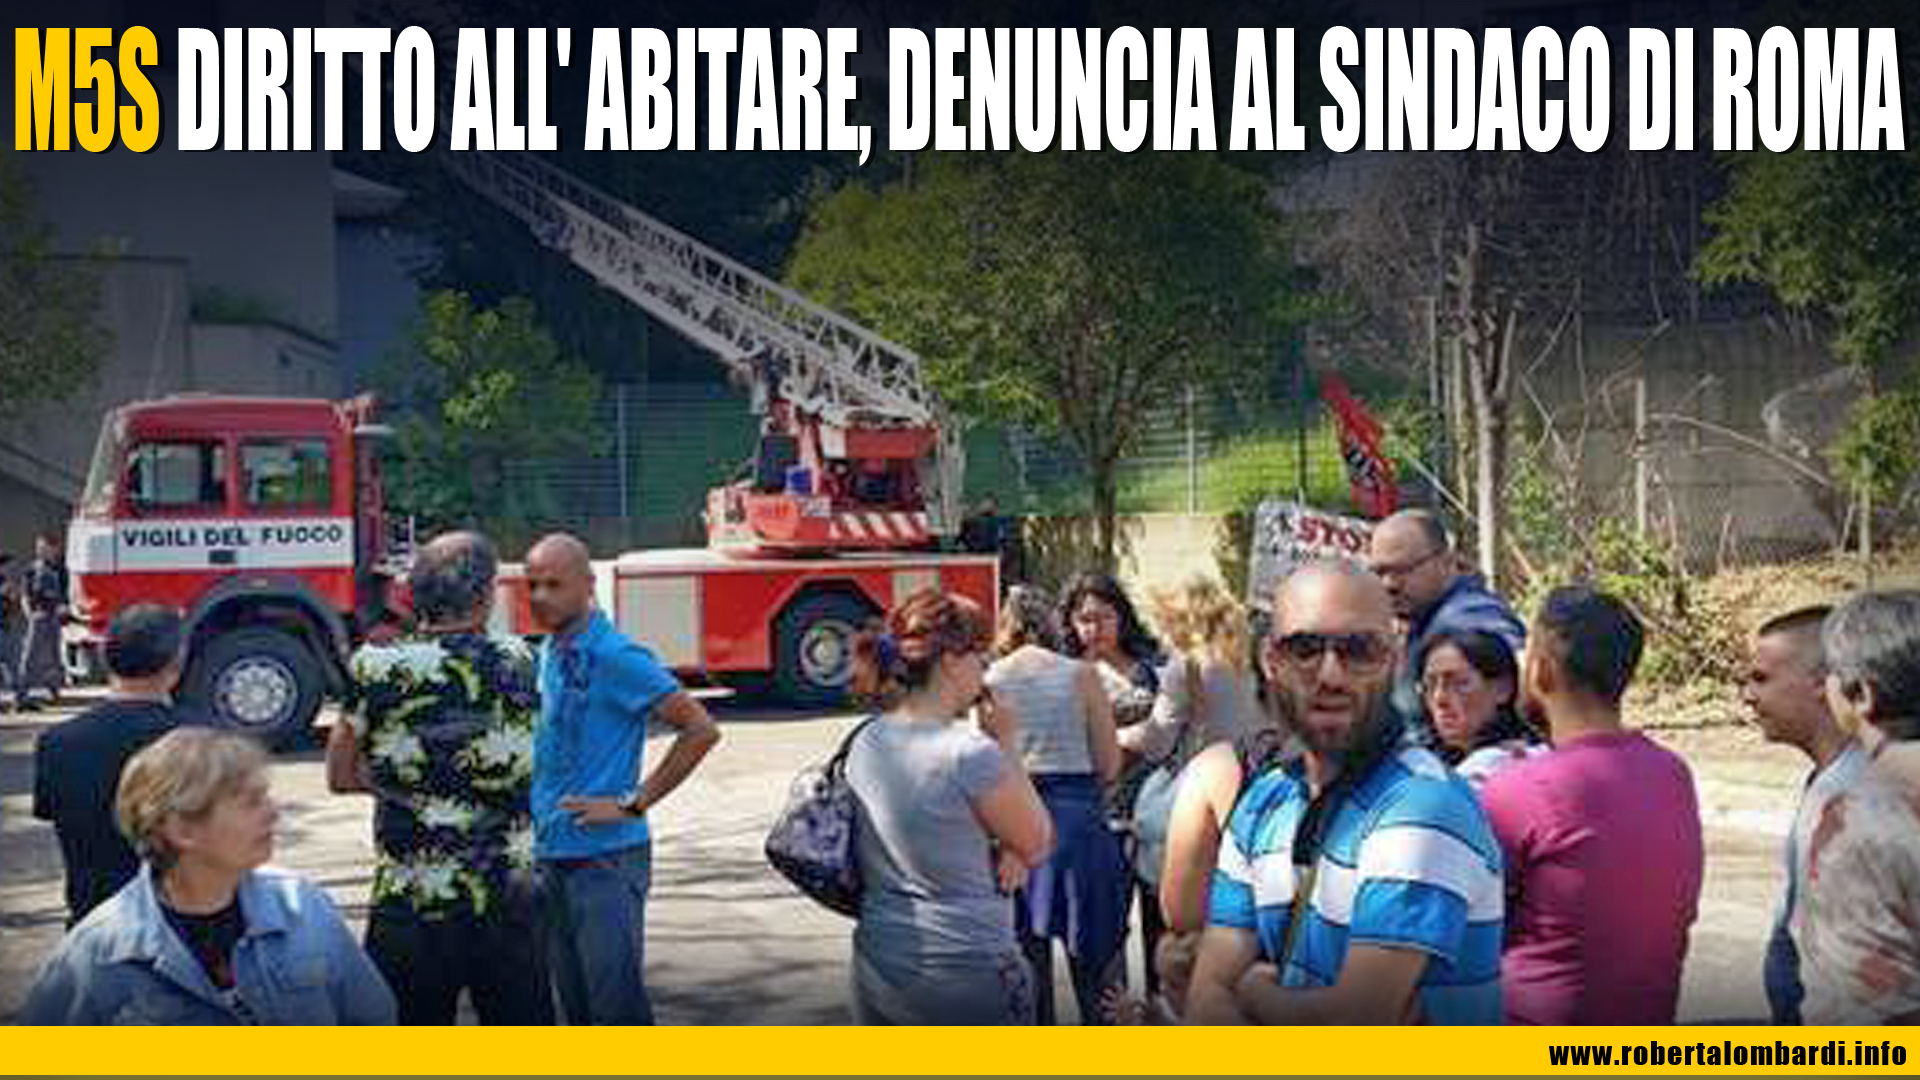 lombardi_denuncia_pdz_sindaco_roma_20_05_2015_